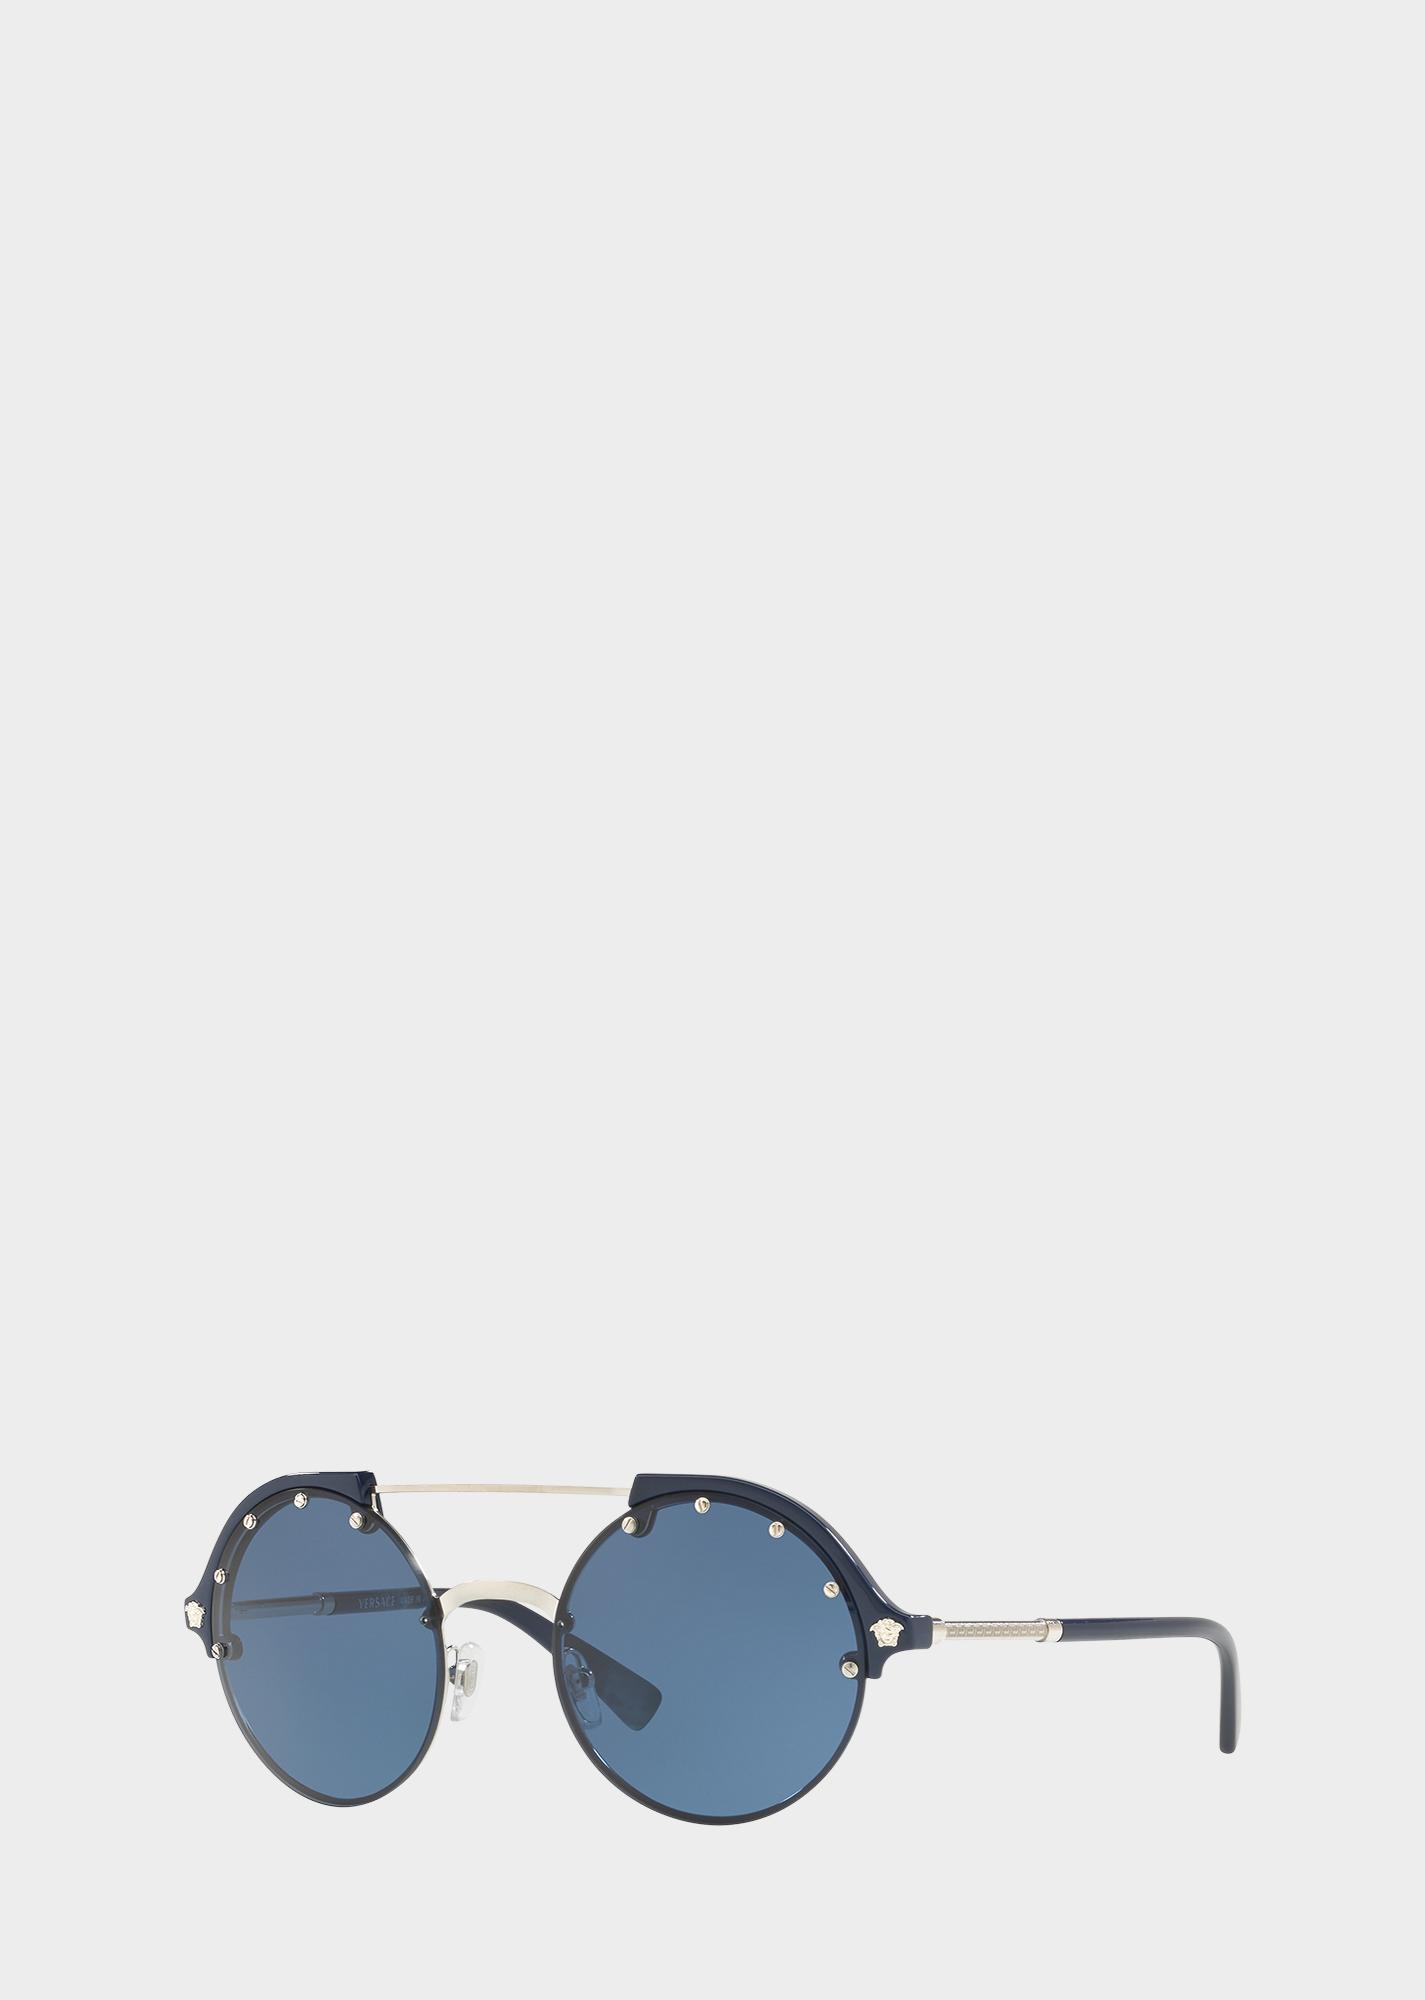 91030772bf1 Versace Blue  Frenergy Round Sunglasses for Women